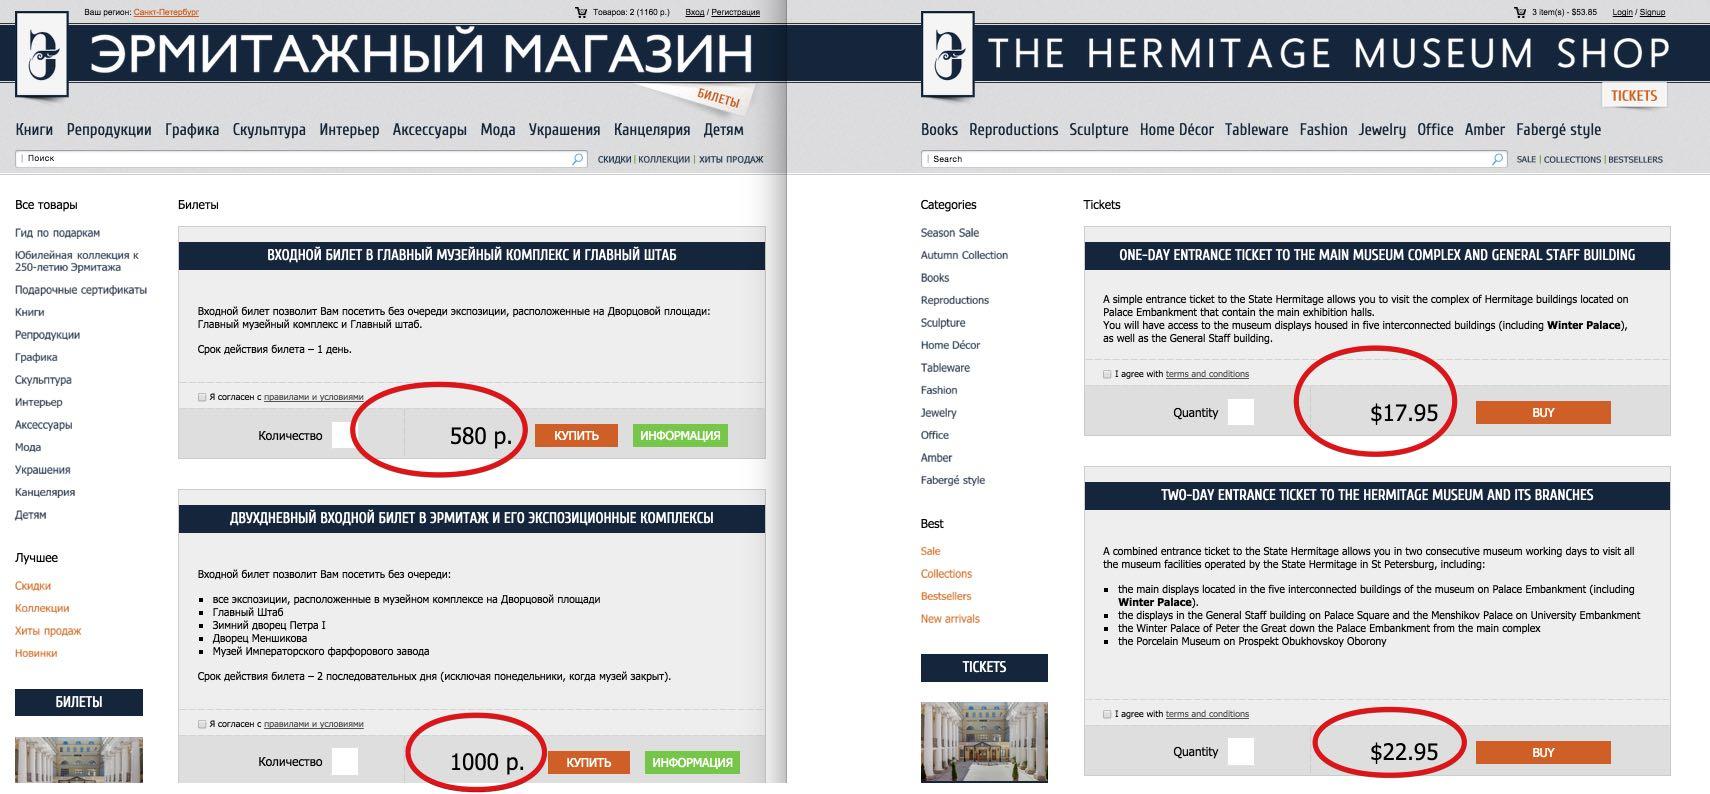 Precio entradas Hermitage - Versión rusa e inglesa